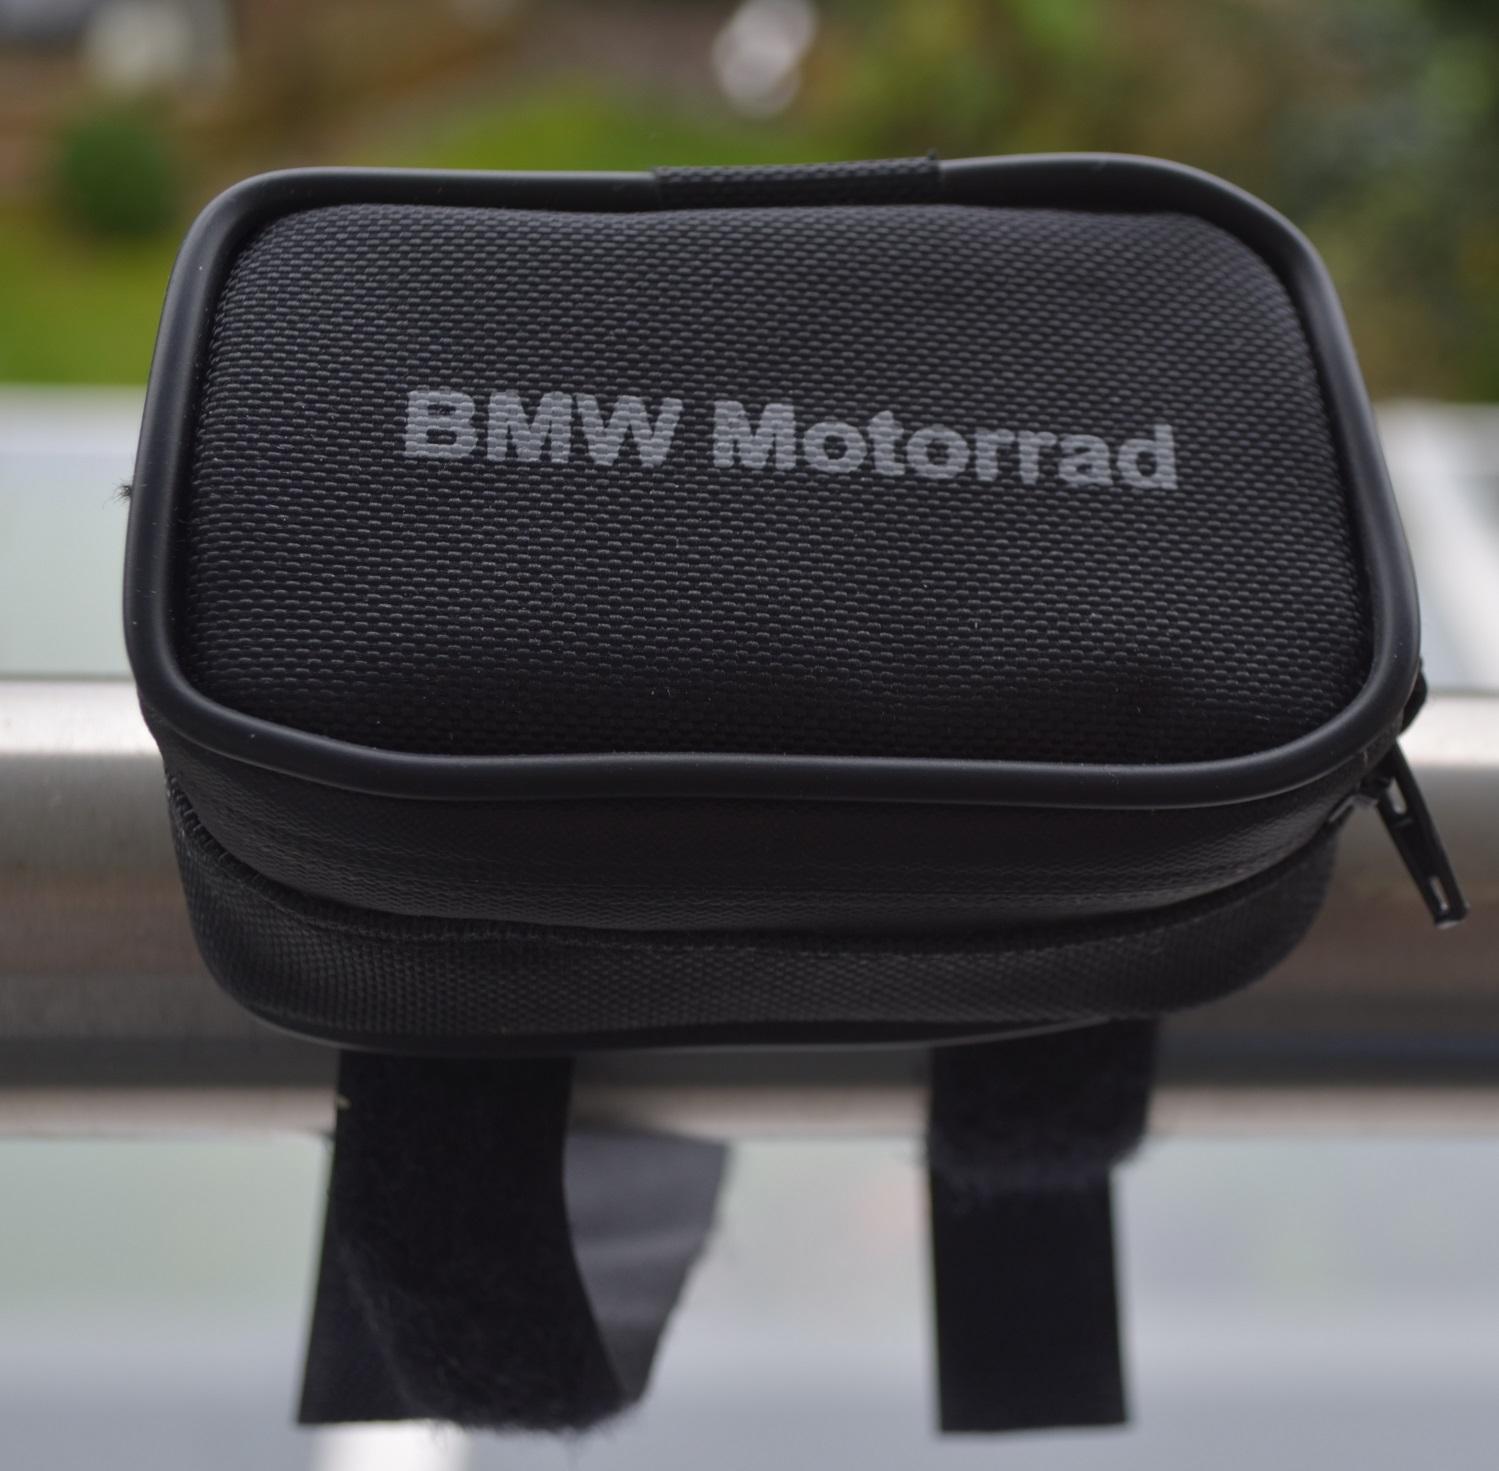 BMW Lenkertasche.JPG